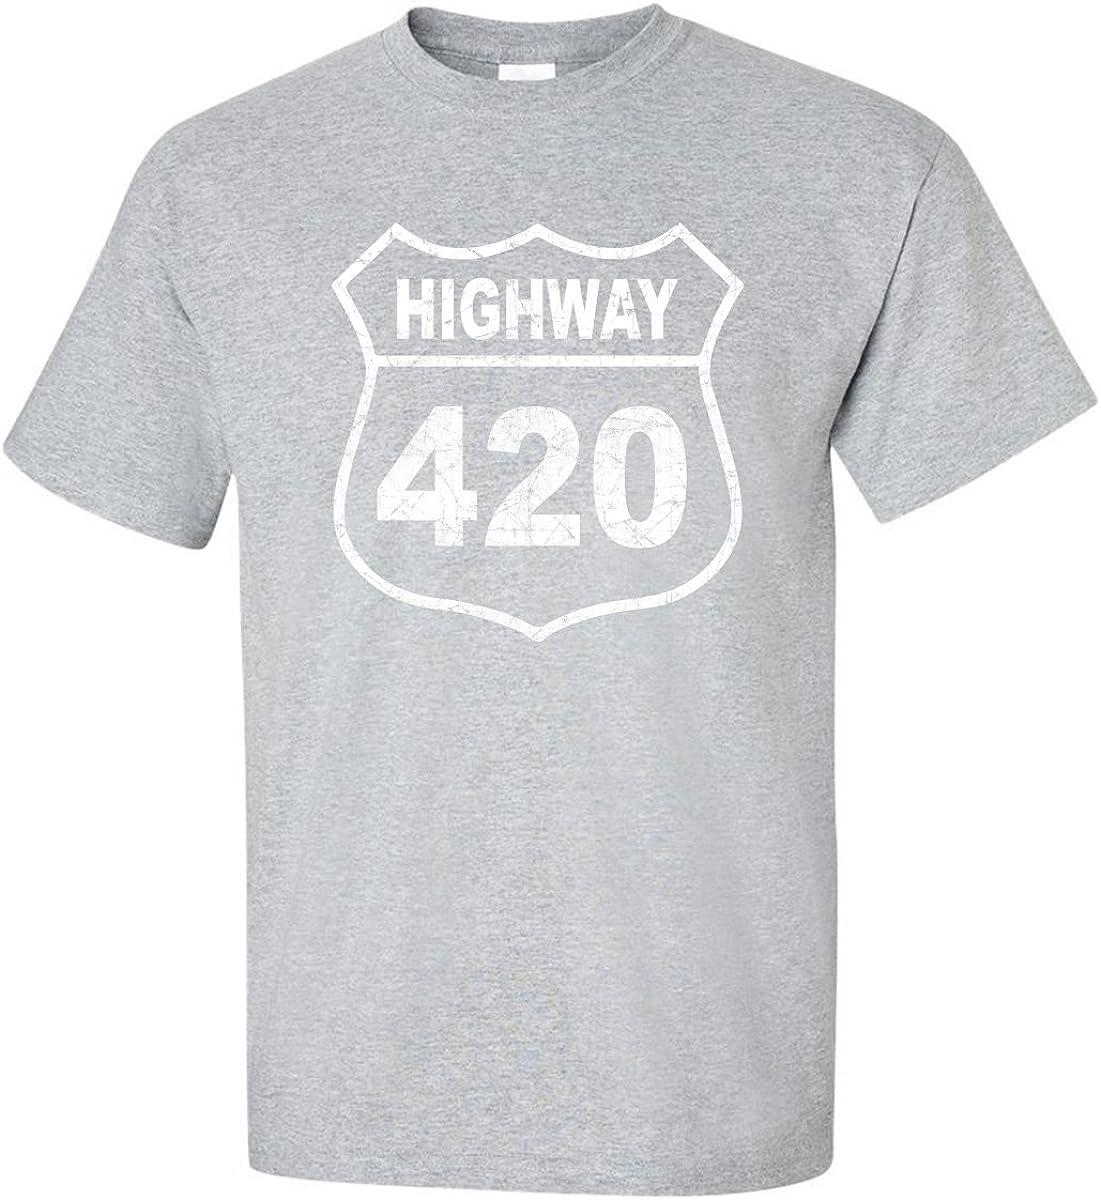 zerogravitee Highway 420 Adult Short Sleeve T-Shirt